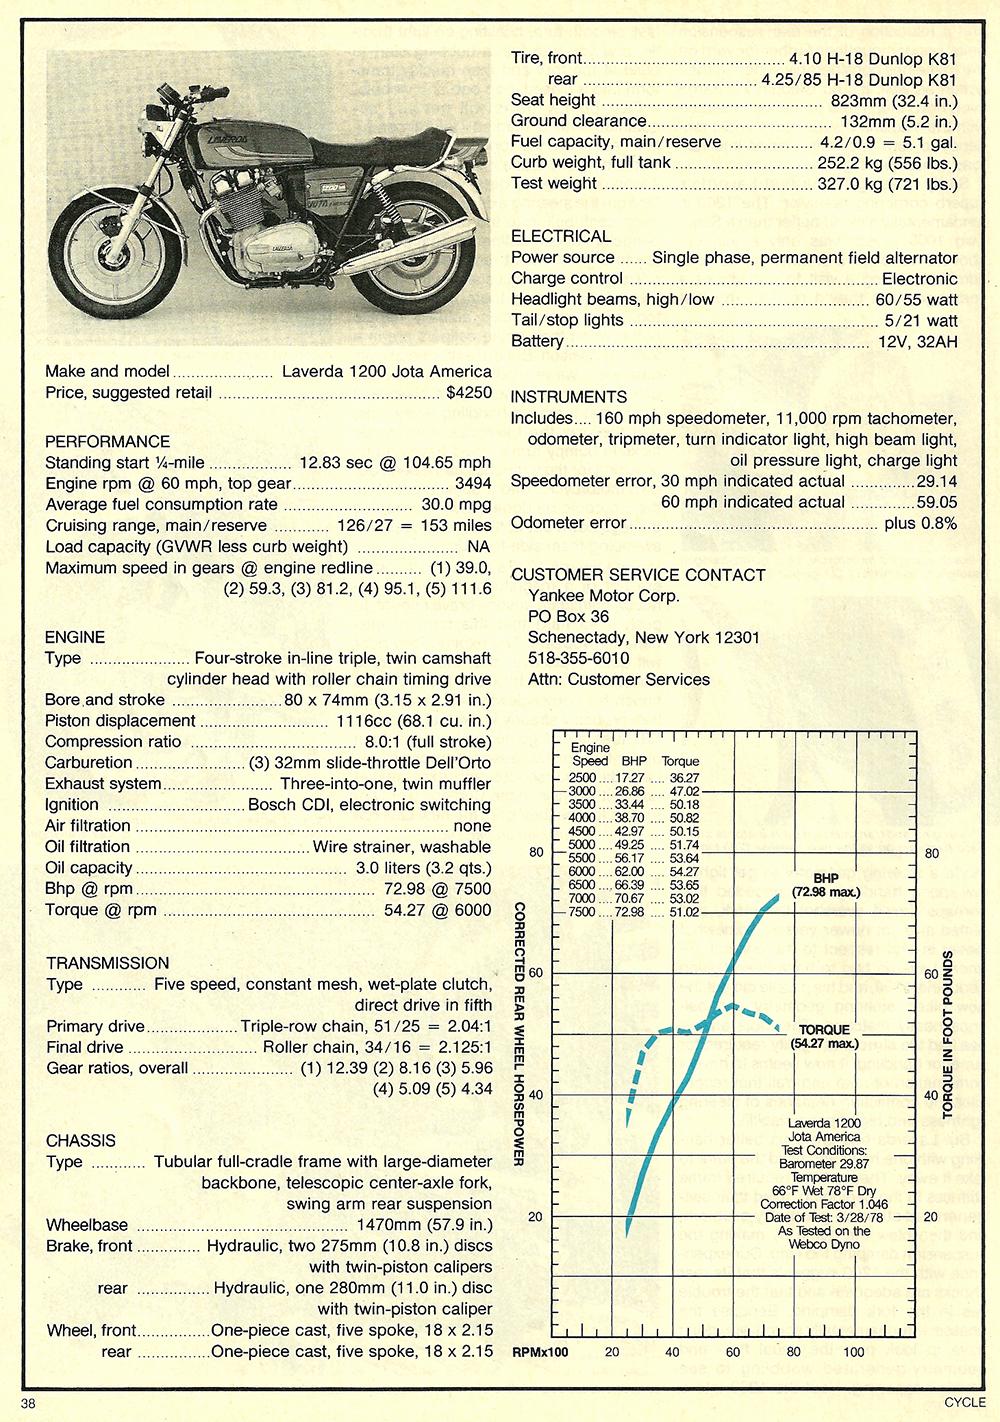 1978 Laverda 1200 Jota America road test 7.jpg